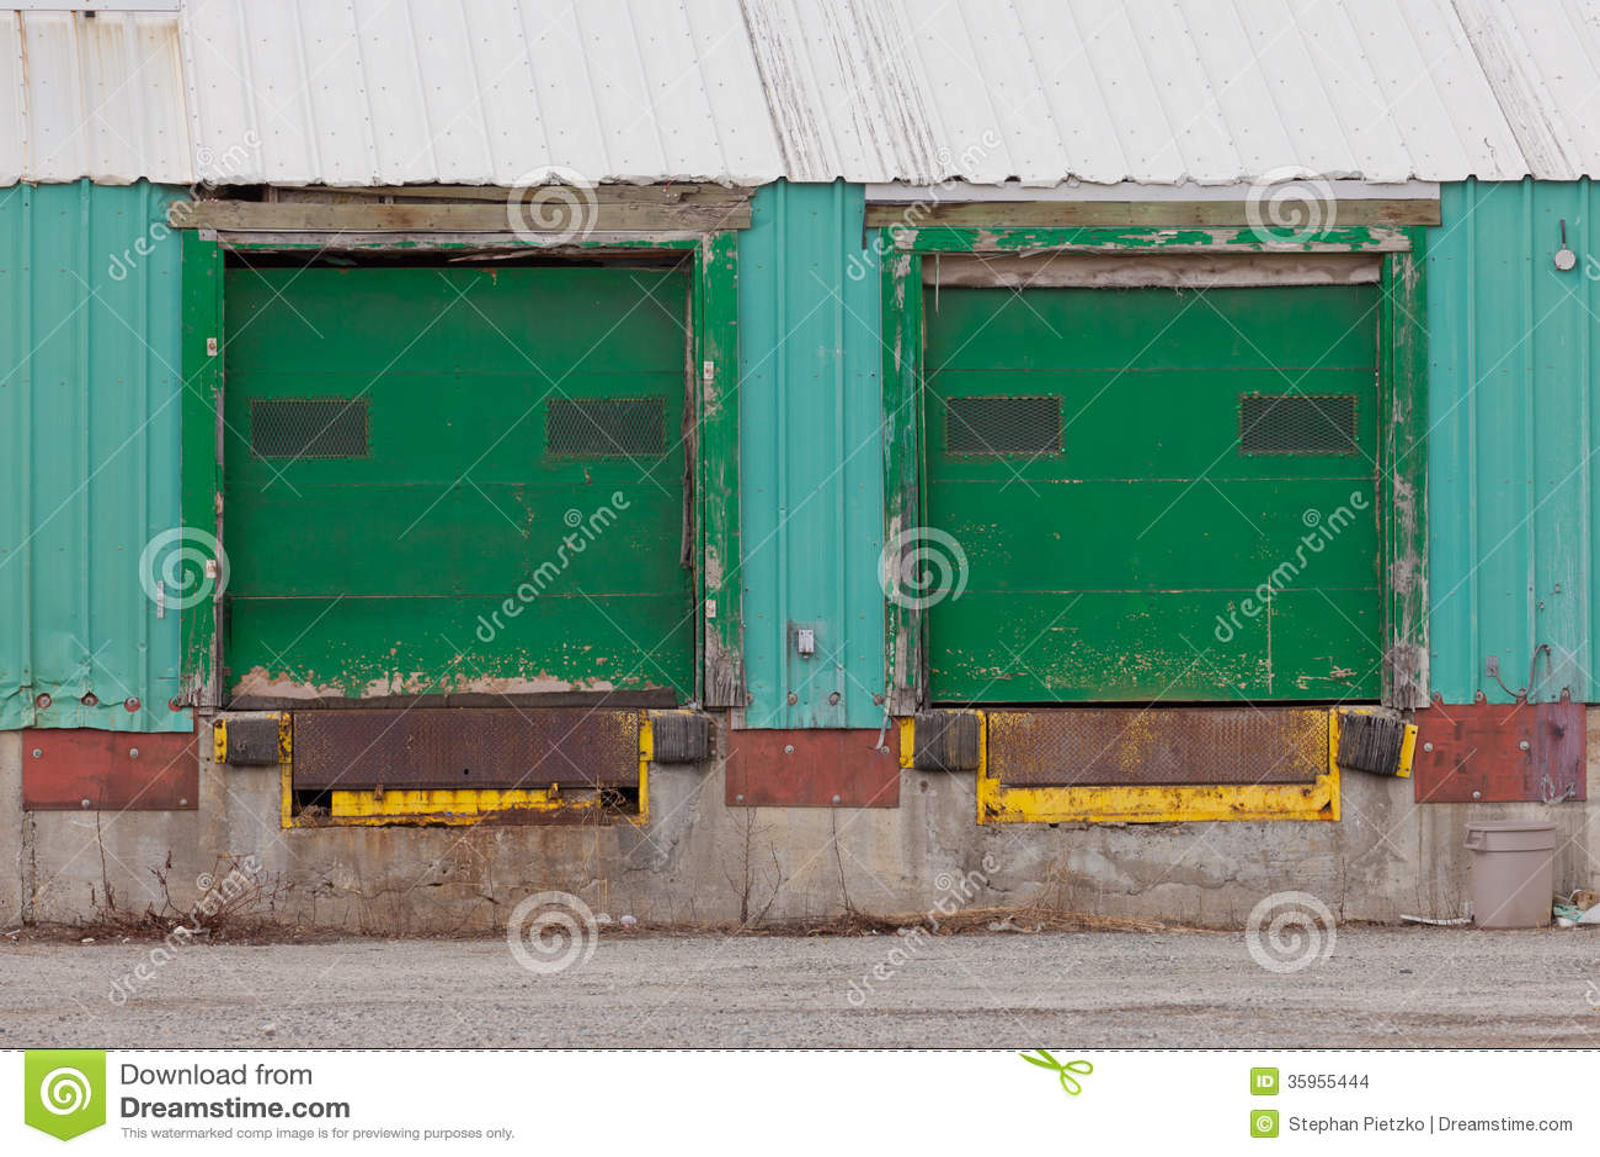 Dos rampas exteriores shuttered verdes de la puerta del cargamento